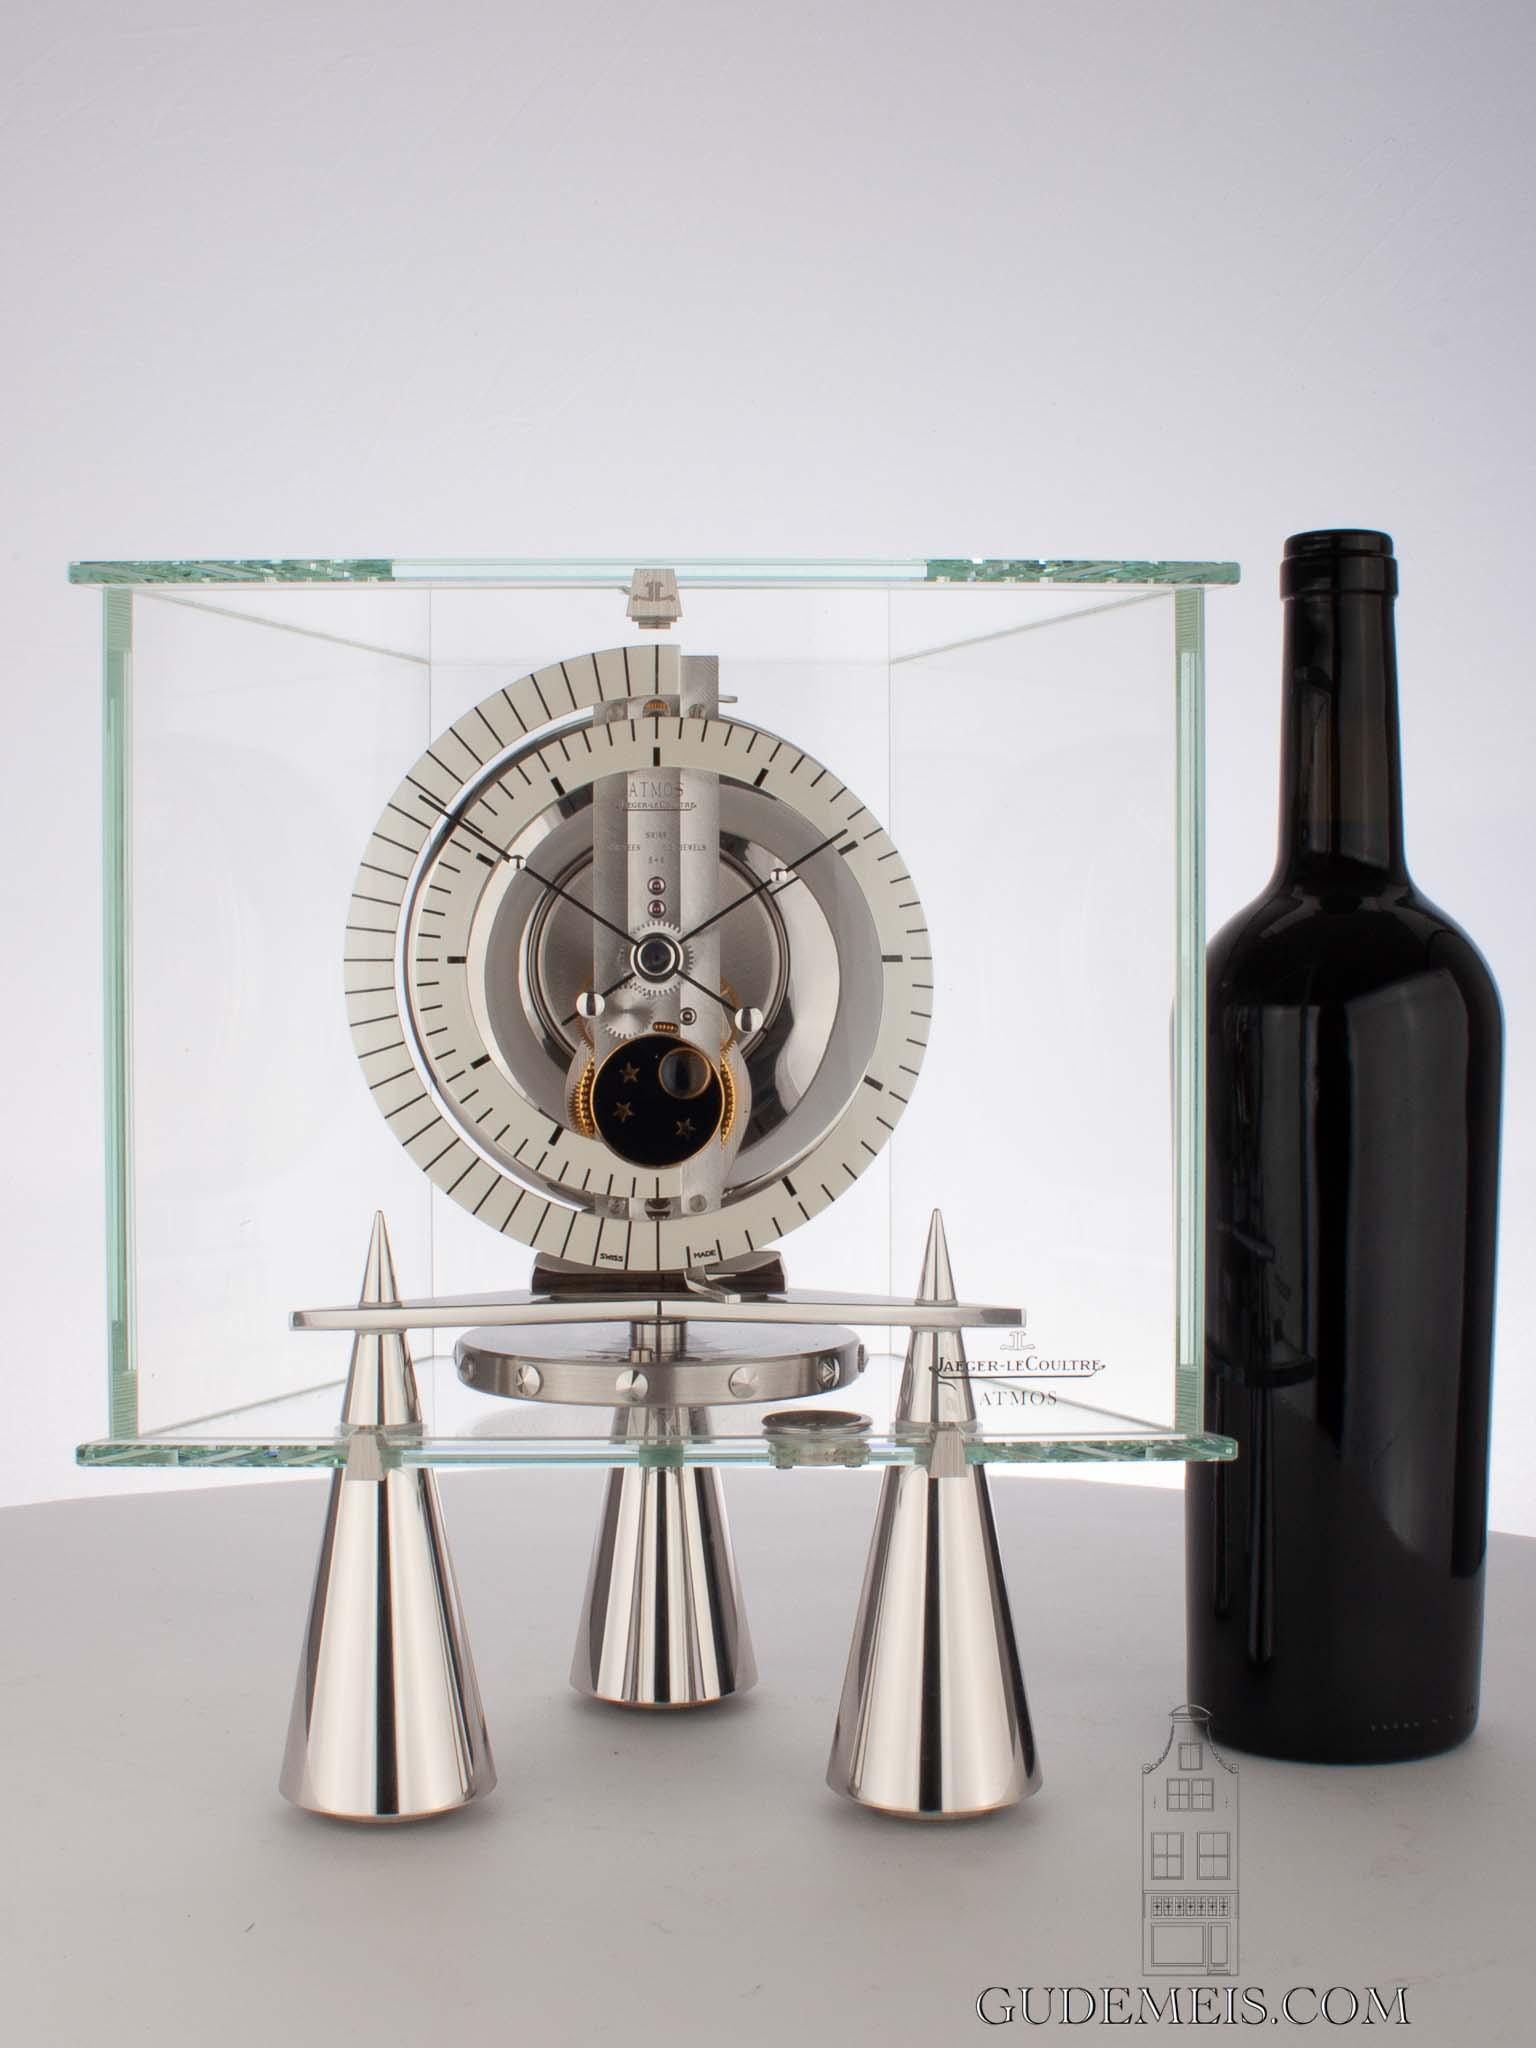 Swiss-rhodium-atmos-atlantis-moonphase-Jaeger-Lecoultre-glass-antique-clock-